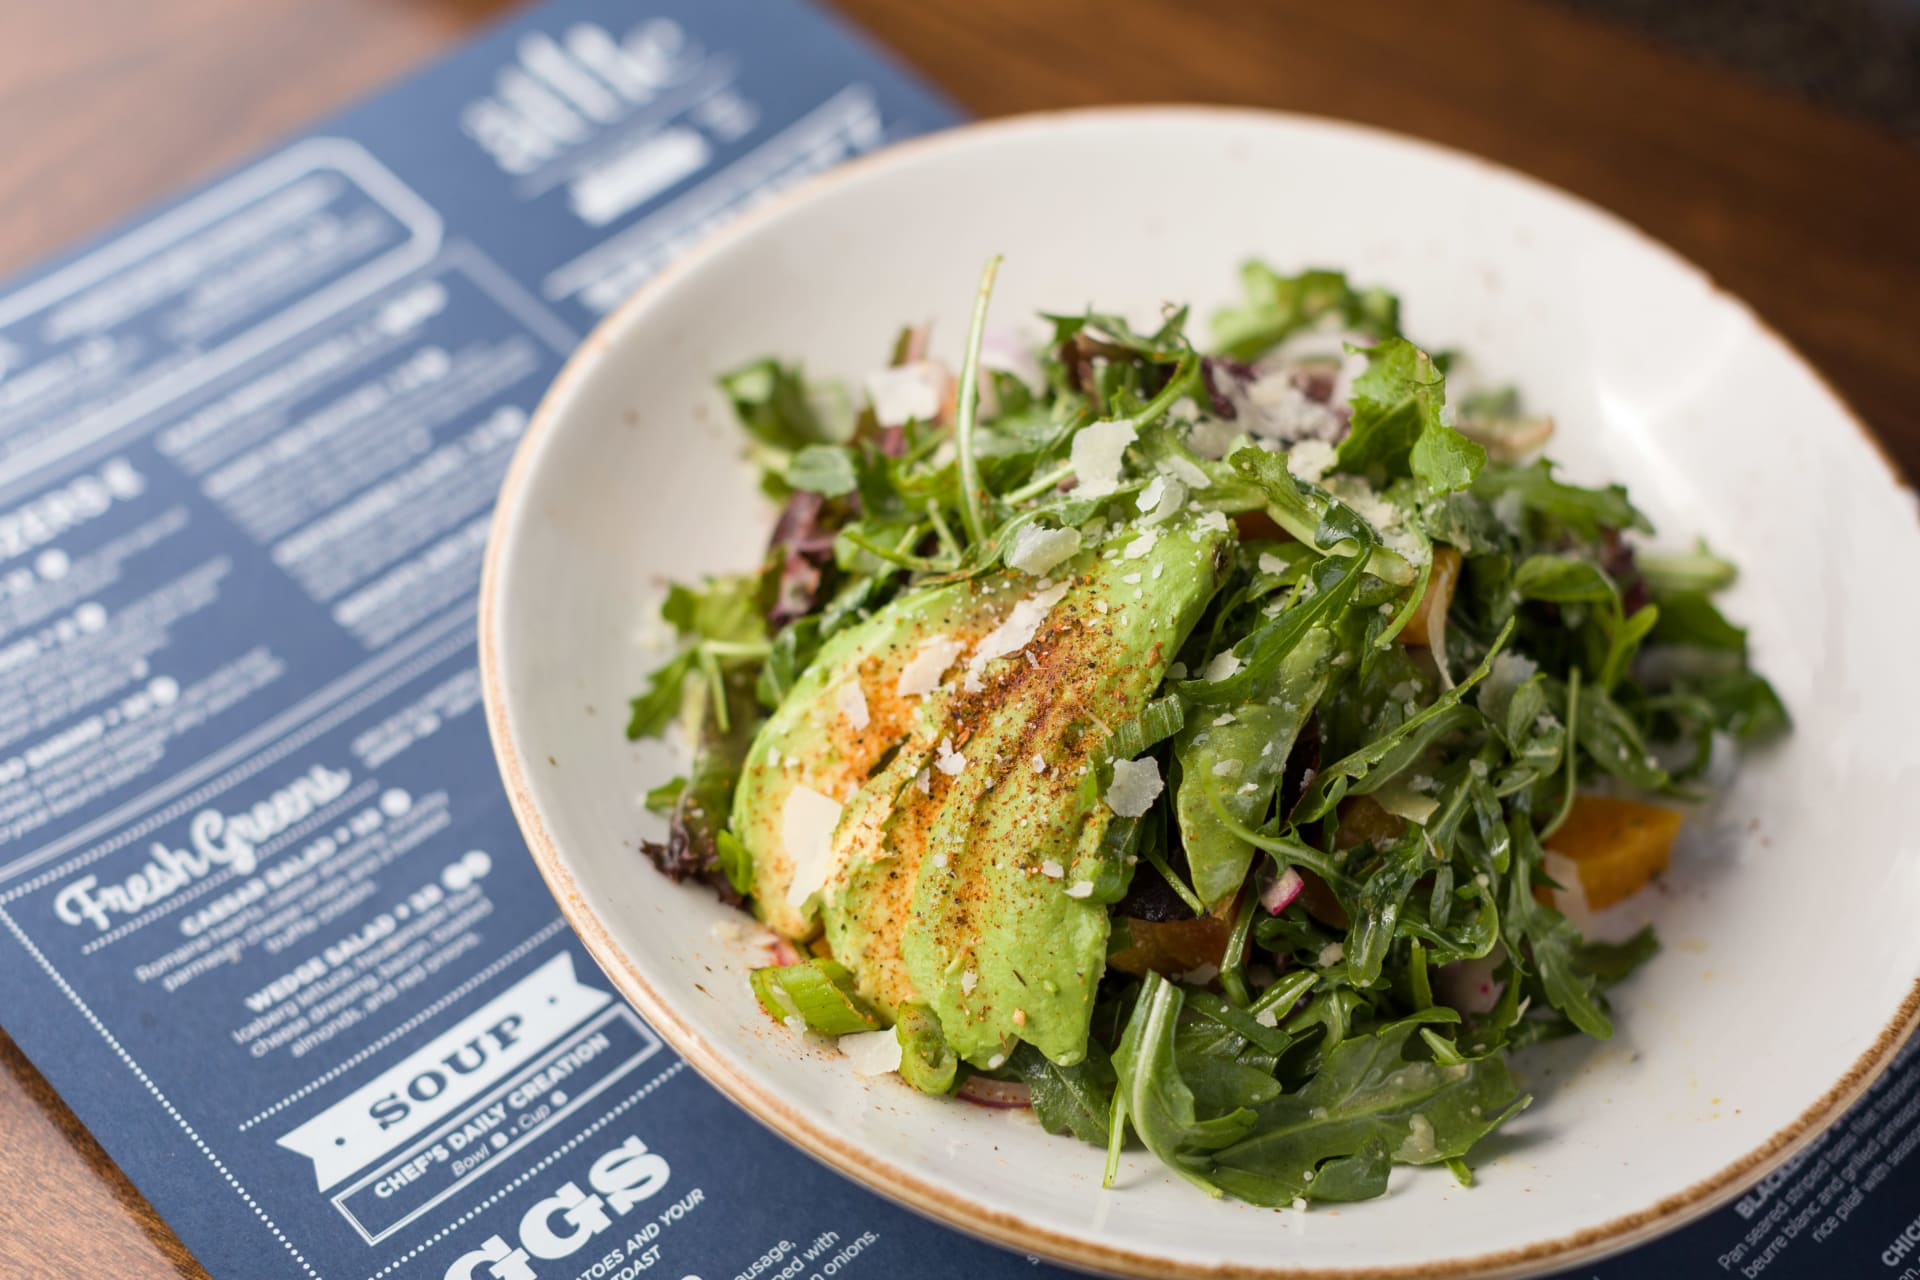 arugula and avocado salad